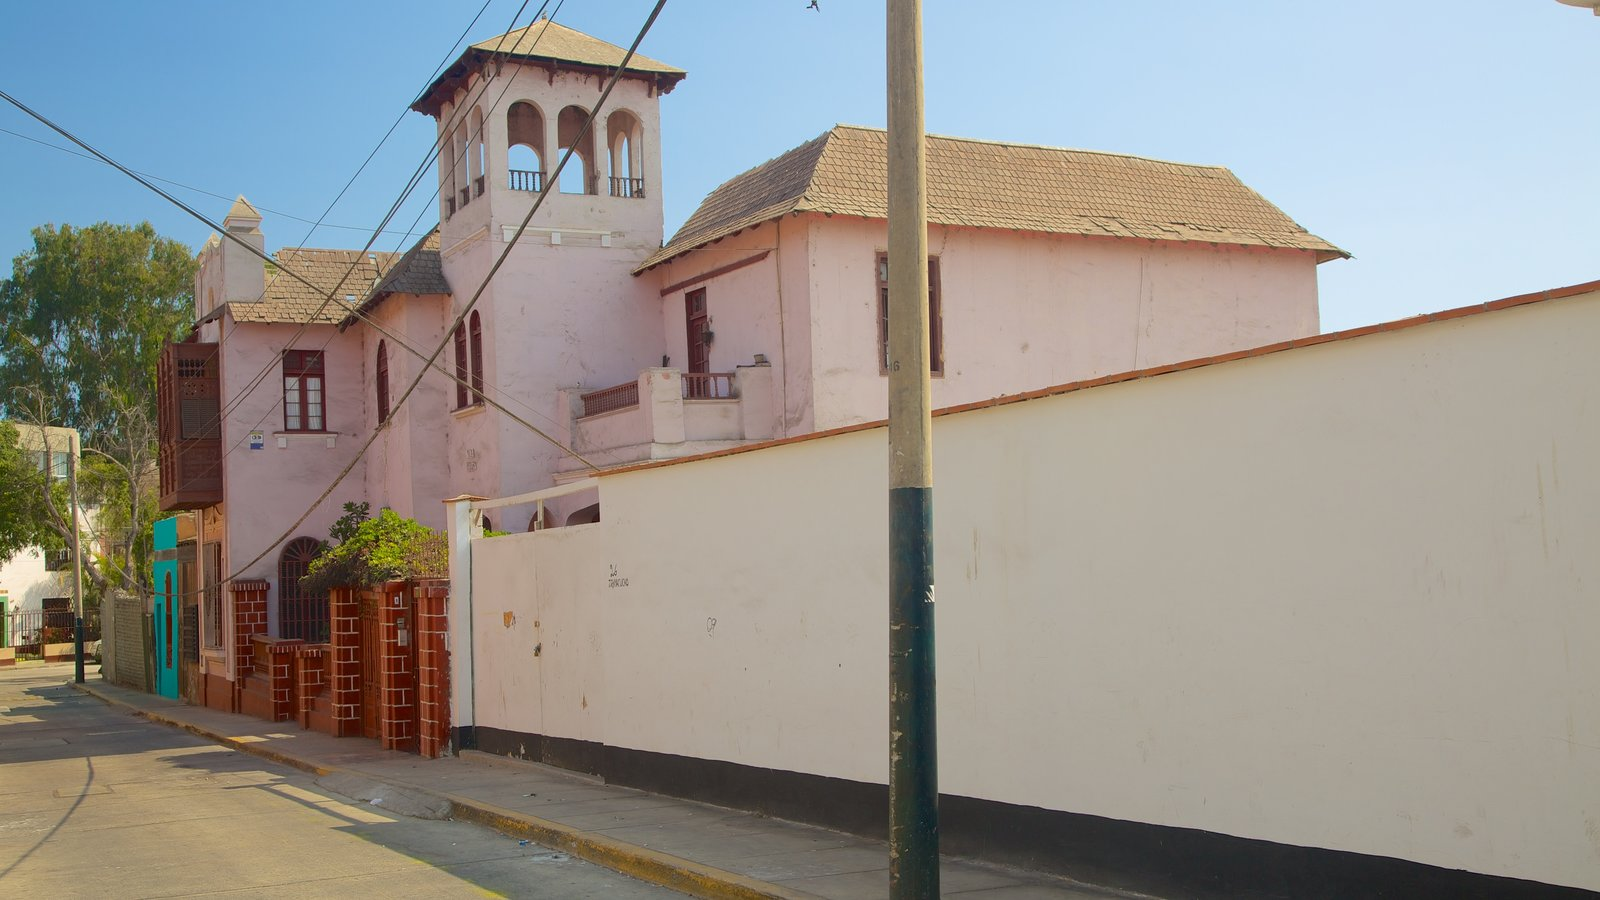 Barranco featuring street scenes